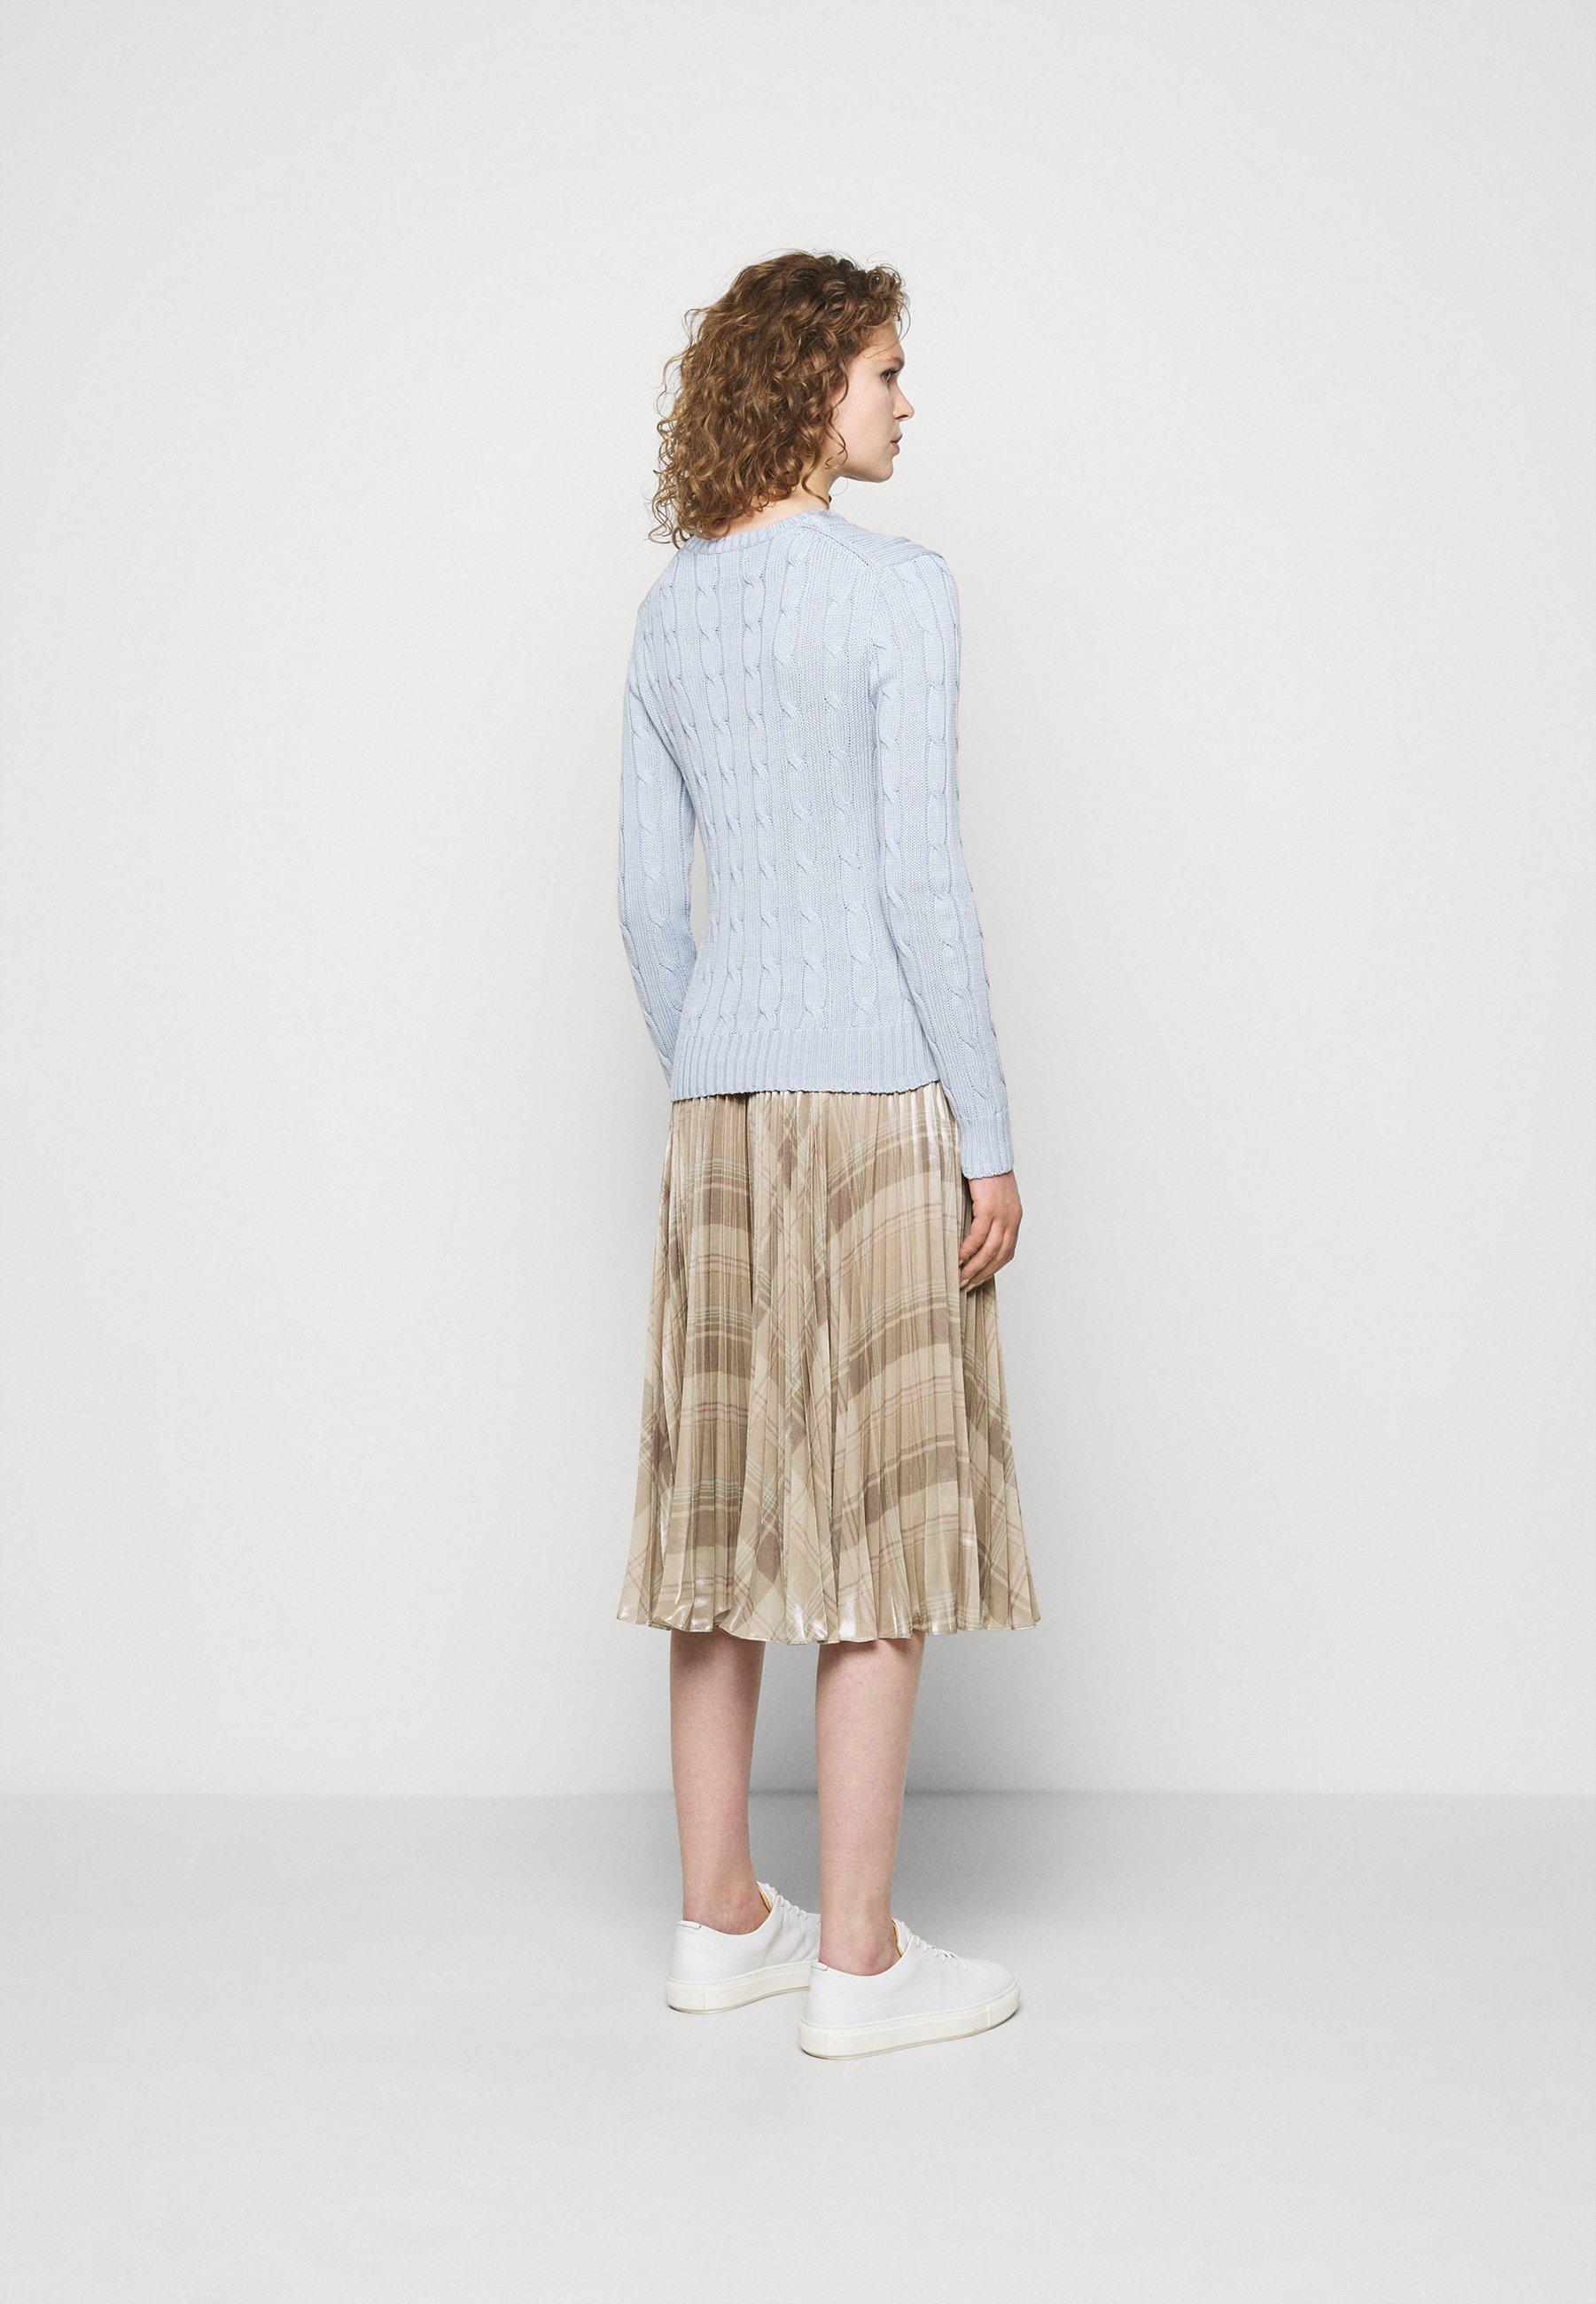 Femme PLAID SKIRT - Jupe plissée